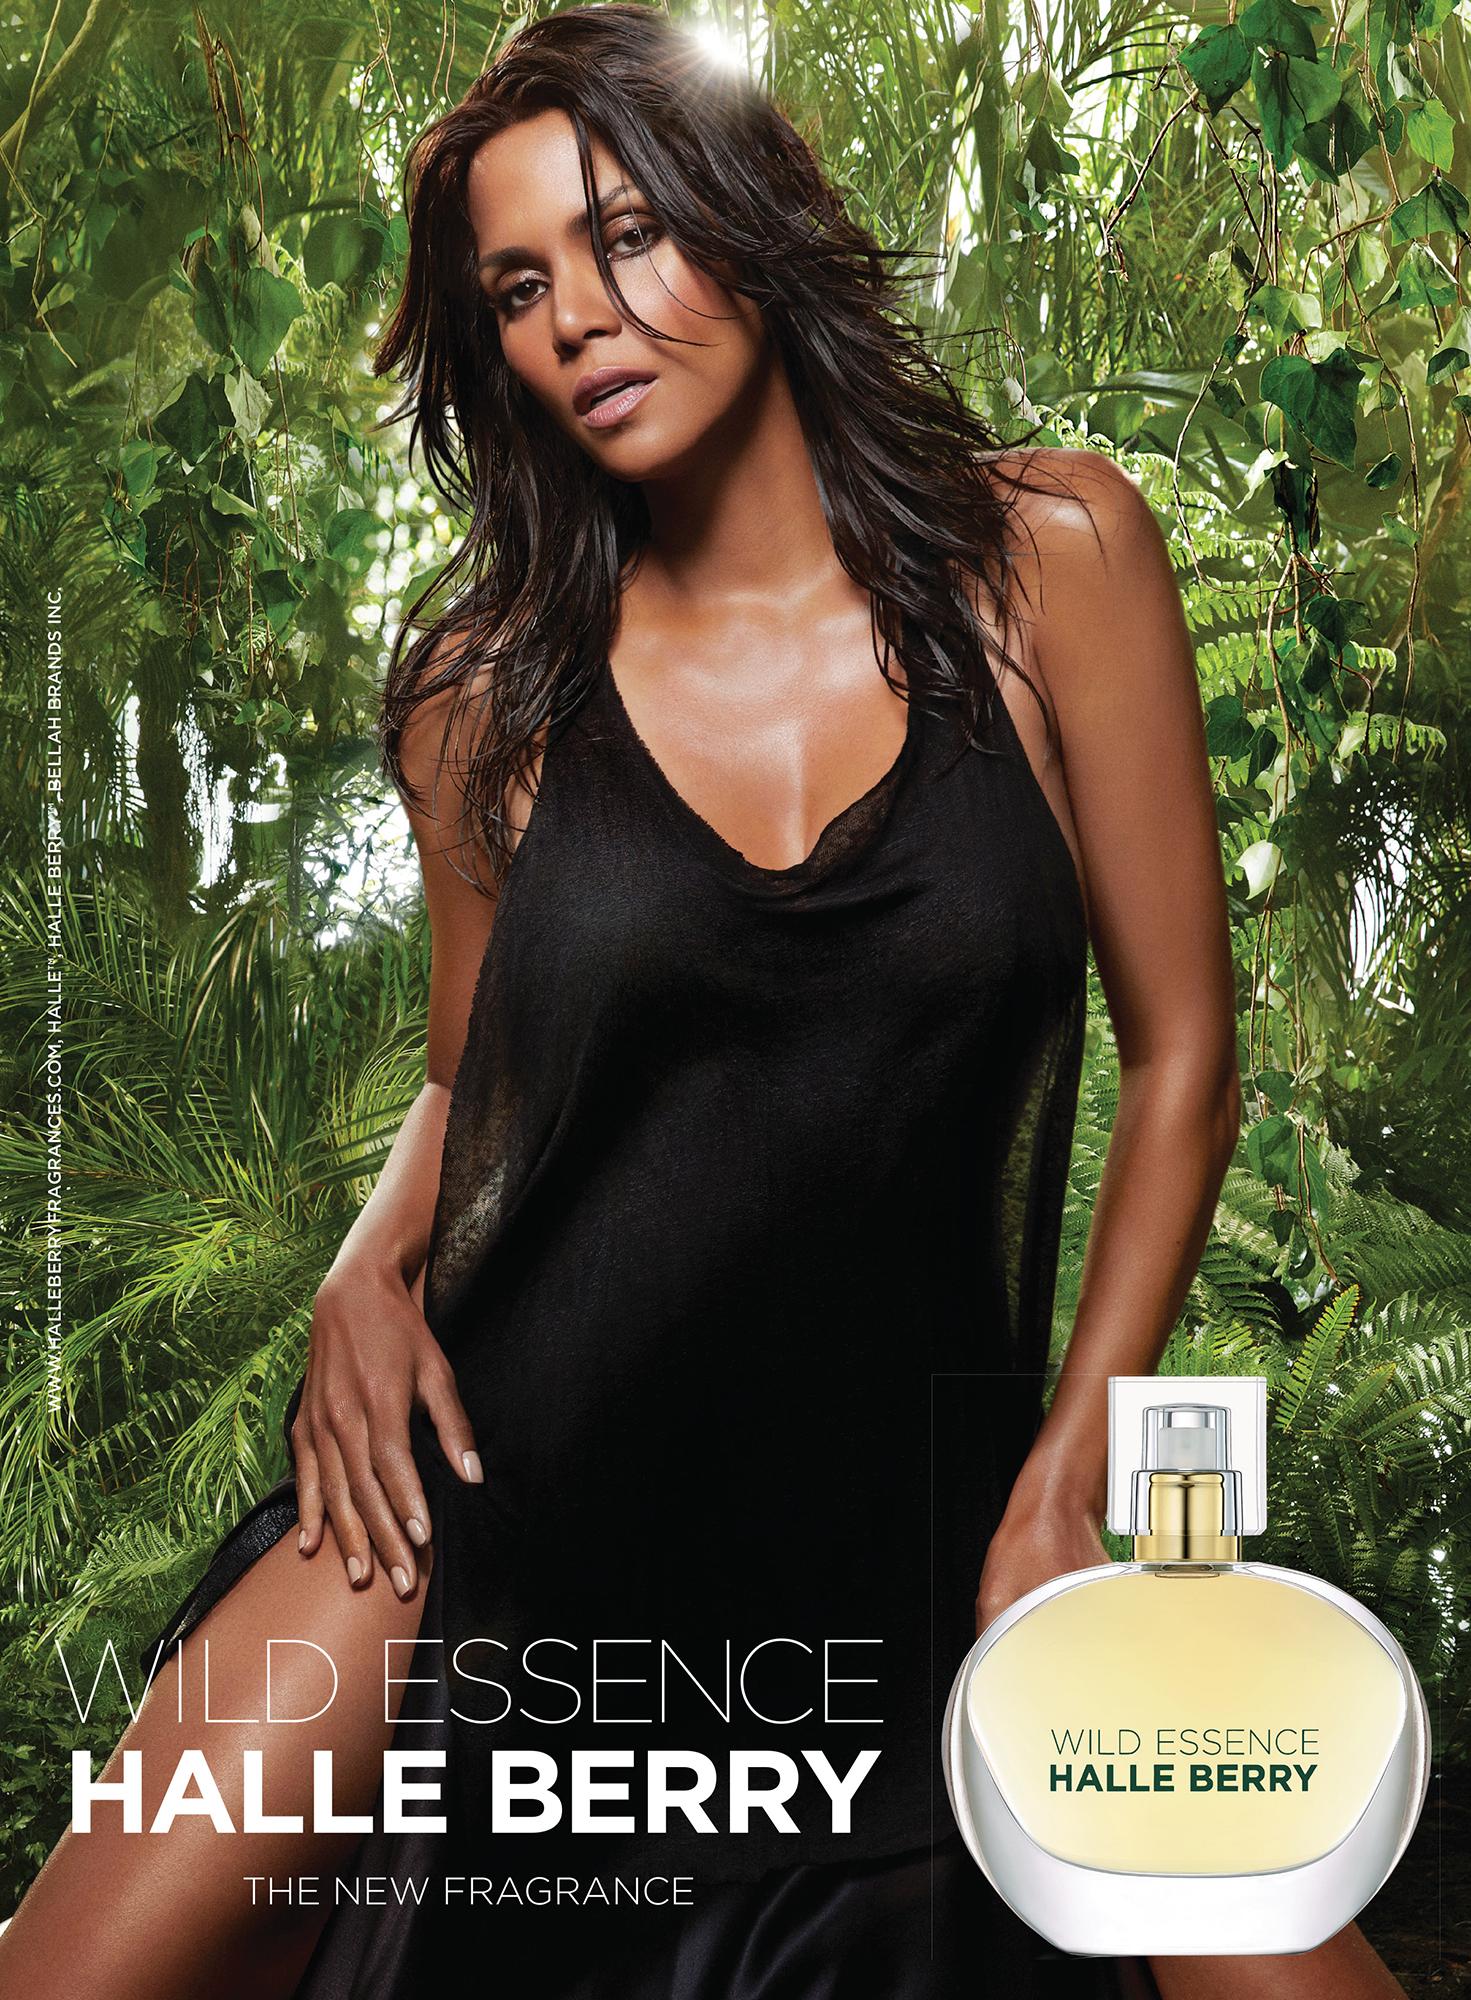 http://www.multivu.com/players/English/7296257-coty-new-women-fragrance-halle-berry-wild-essence/gallery/image/90f7b830-cd1c-4a37-b983-20317a70cc8a.HR.jpg